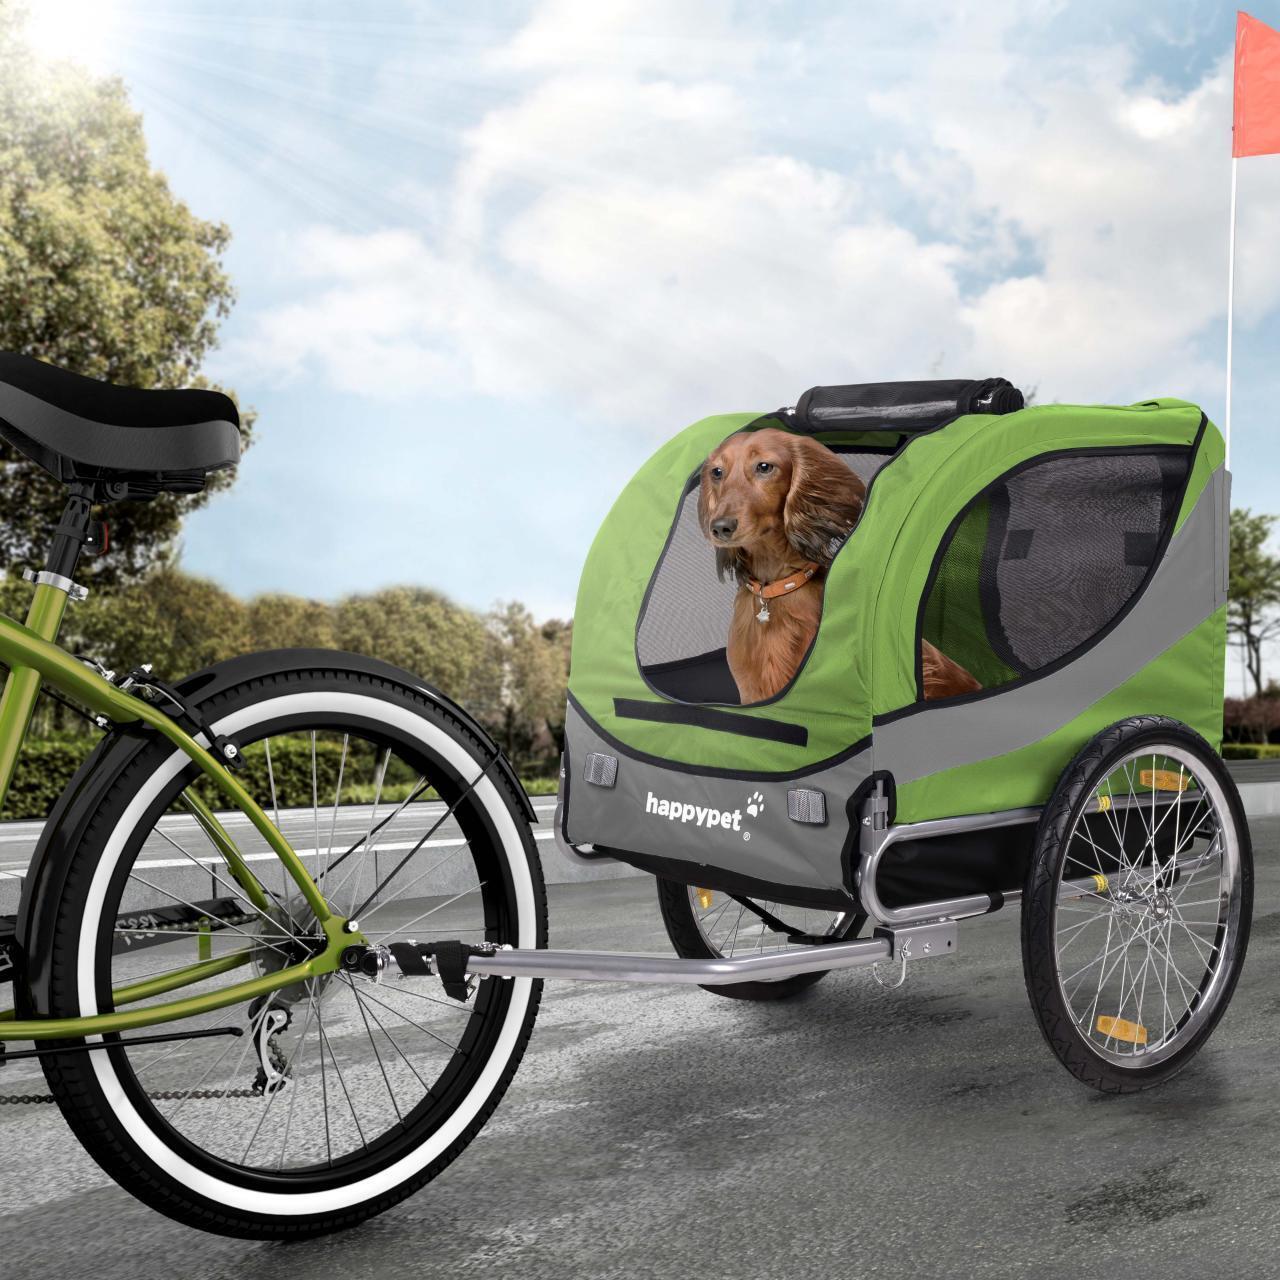 HAPPYPET Fahrradanhänger für Hunde Anhänger